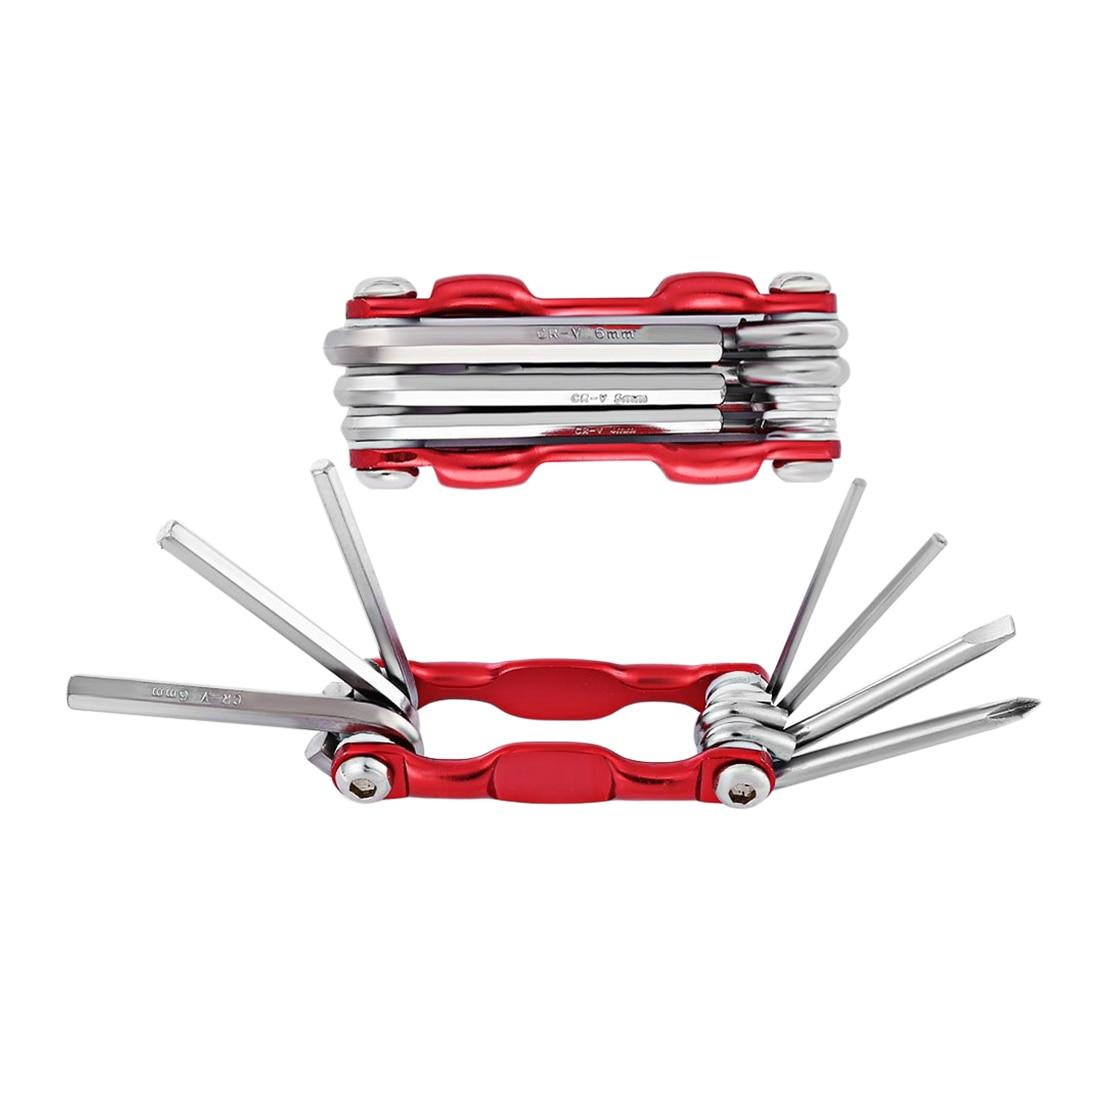 Casecover 1//4 6.5mm Socket Wrench Head Metric Socket Set Socket Wrench Kit Bolt Hexagon Allen Head Torque Wrench Sleeve Head